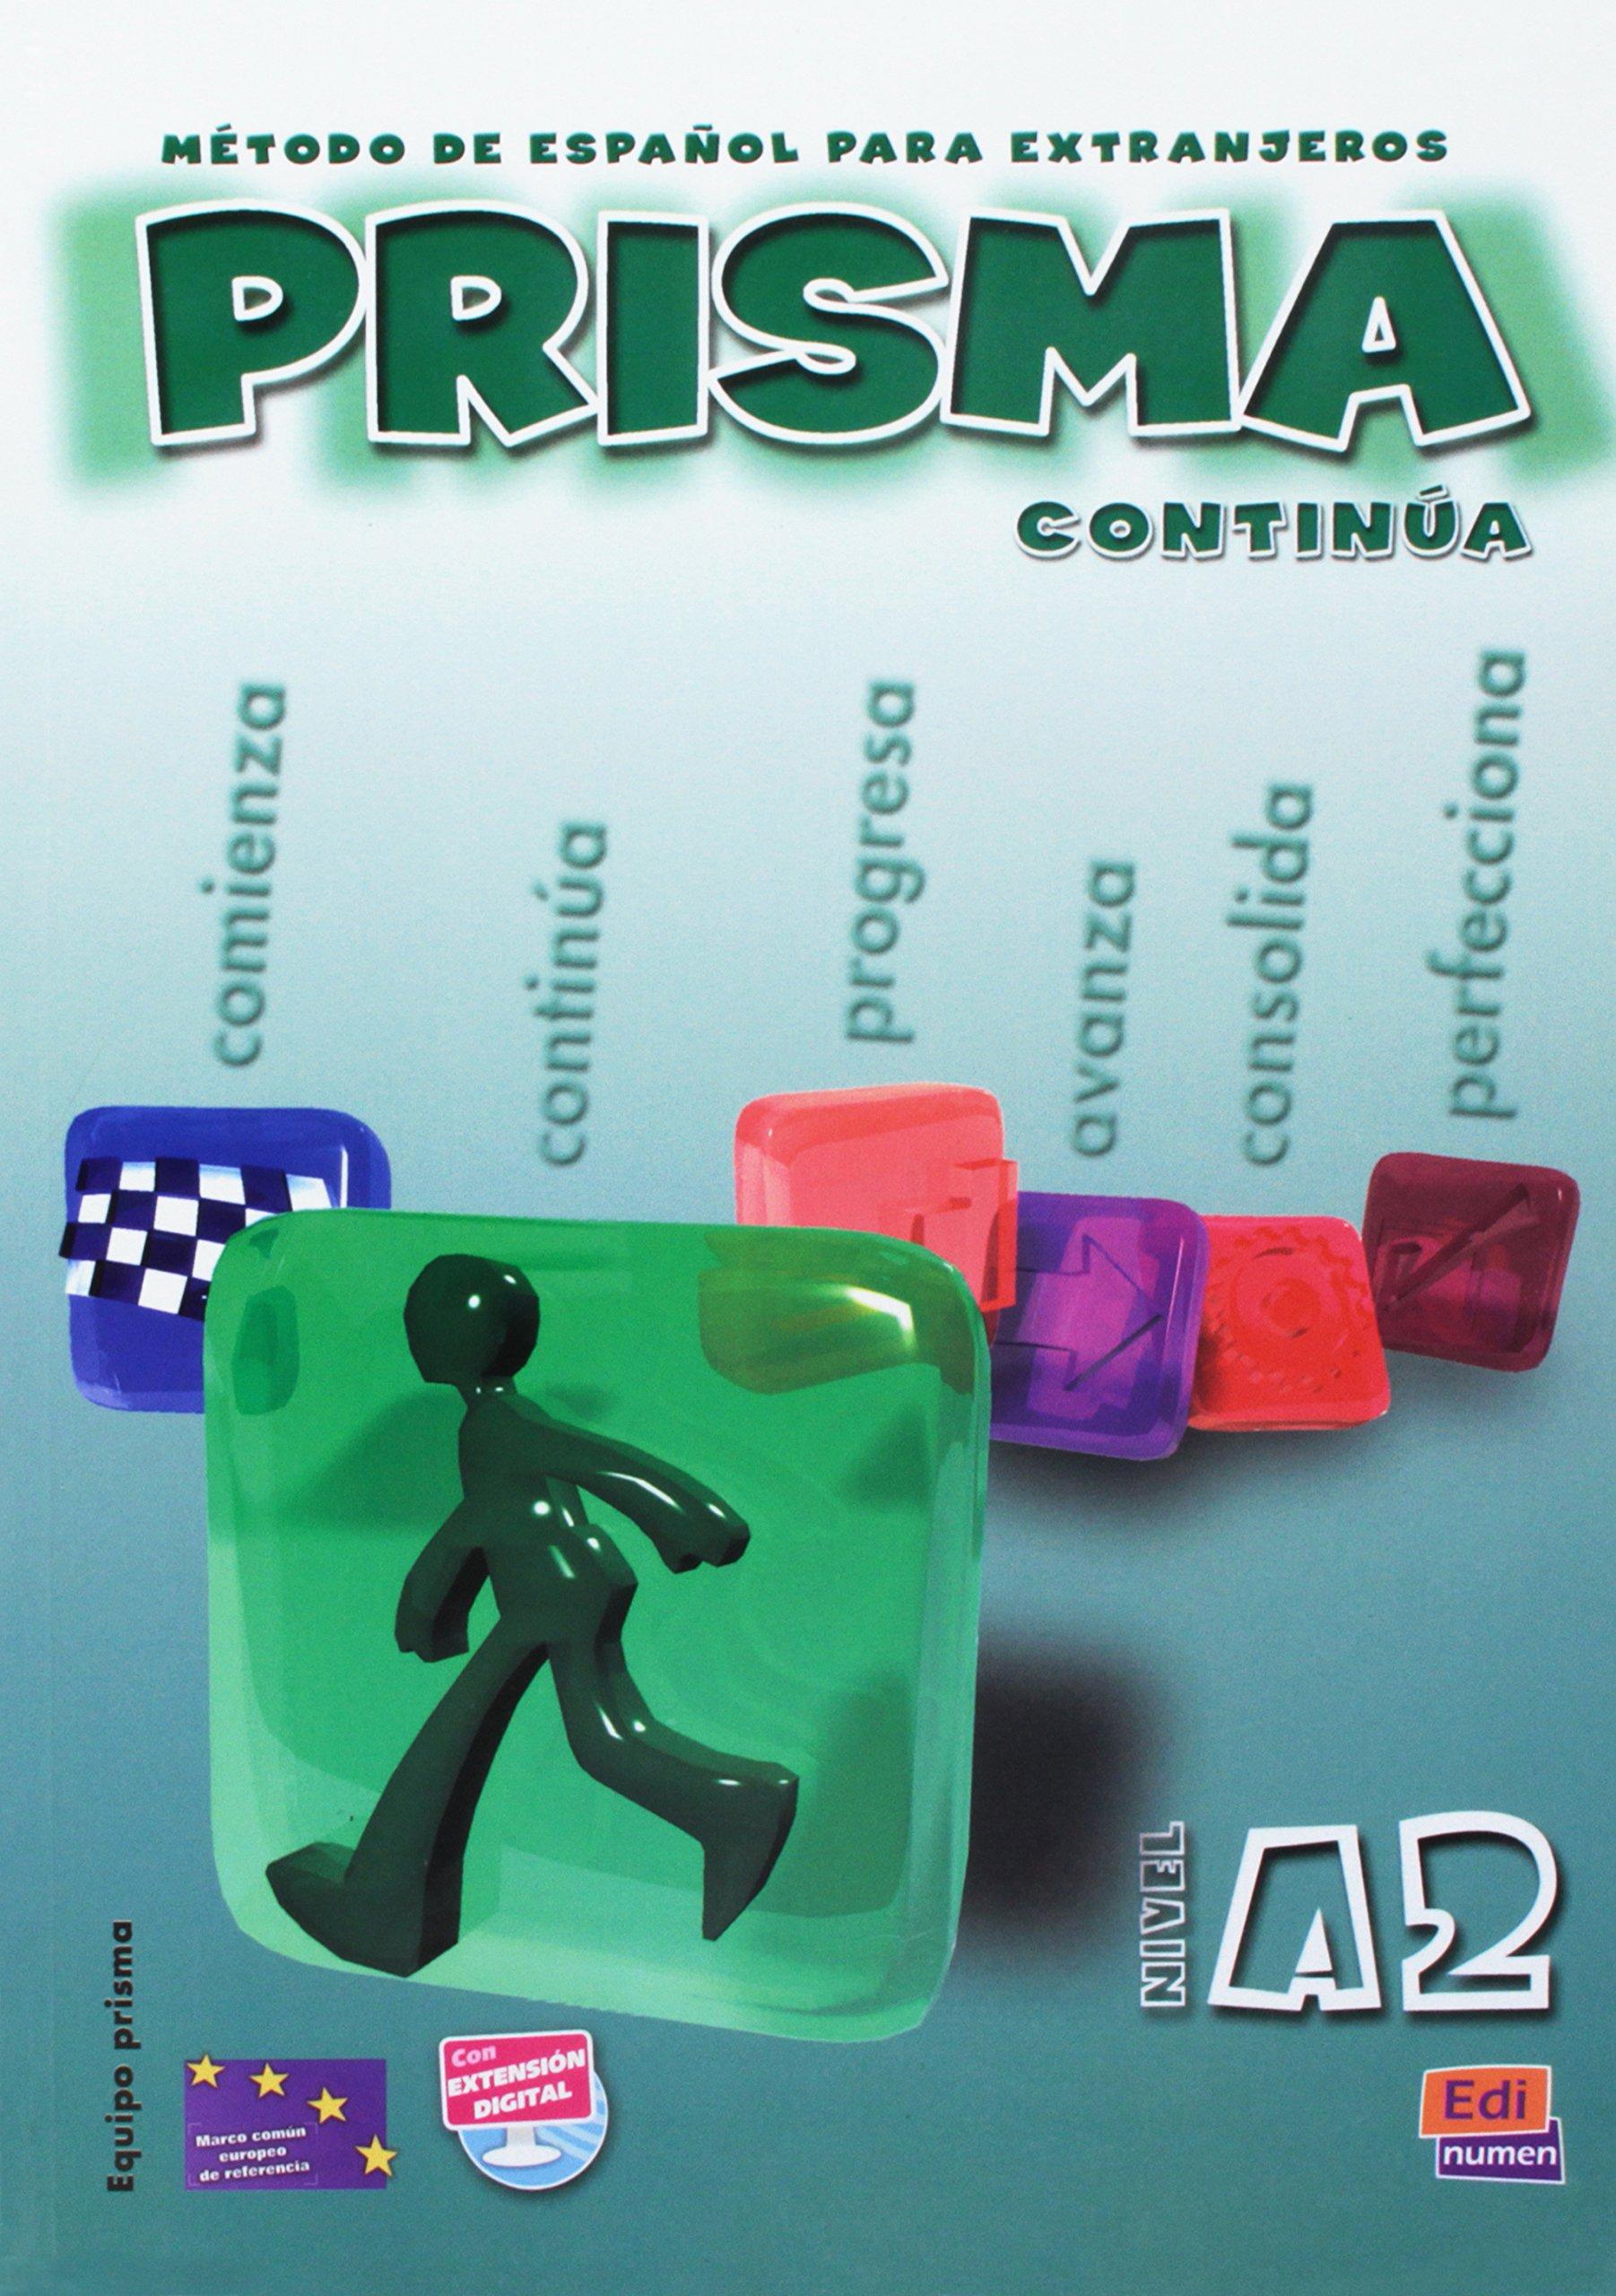 Prisma A2 Continua / Prisma A2 Continue: Metodo de espanol ...